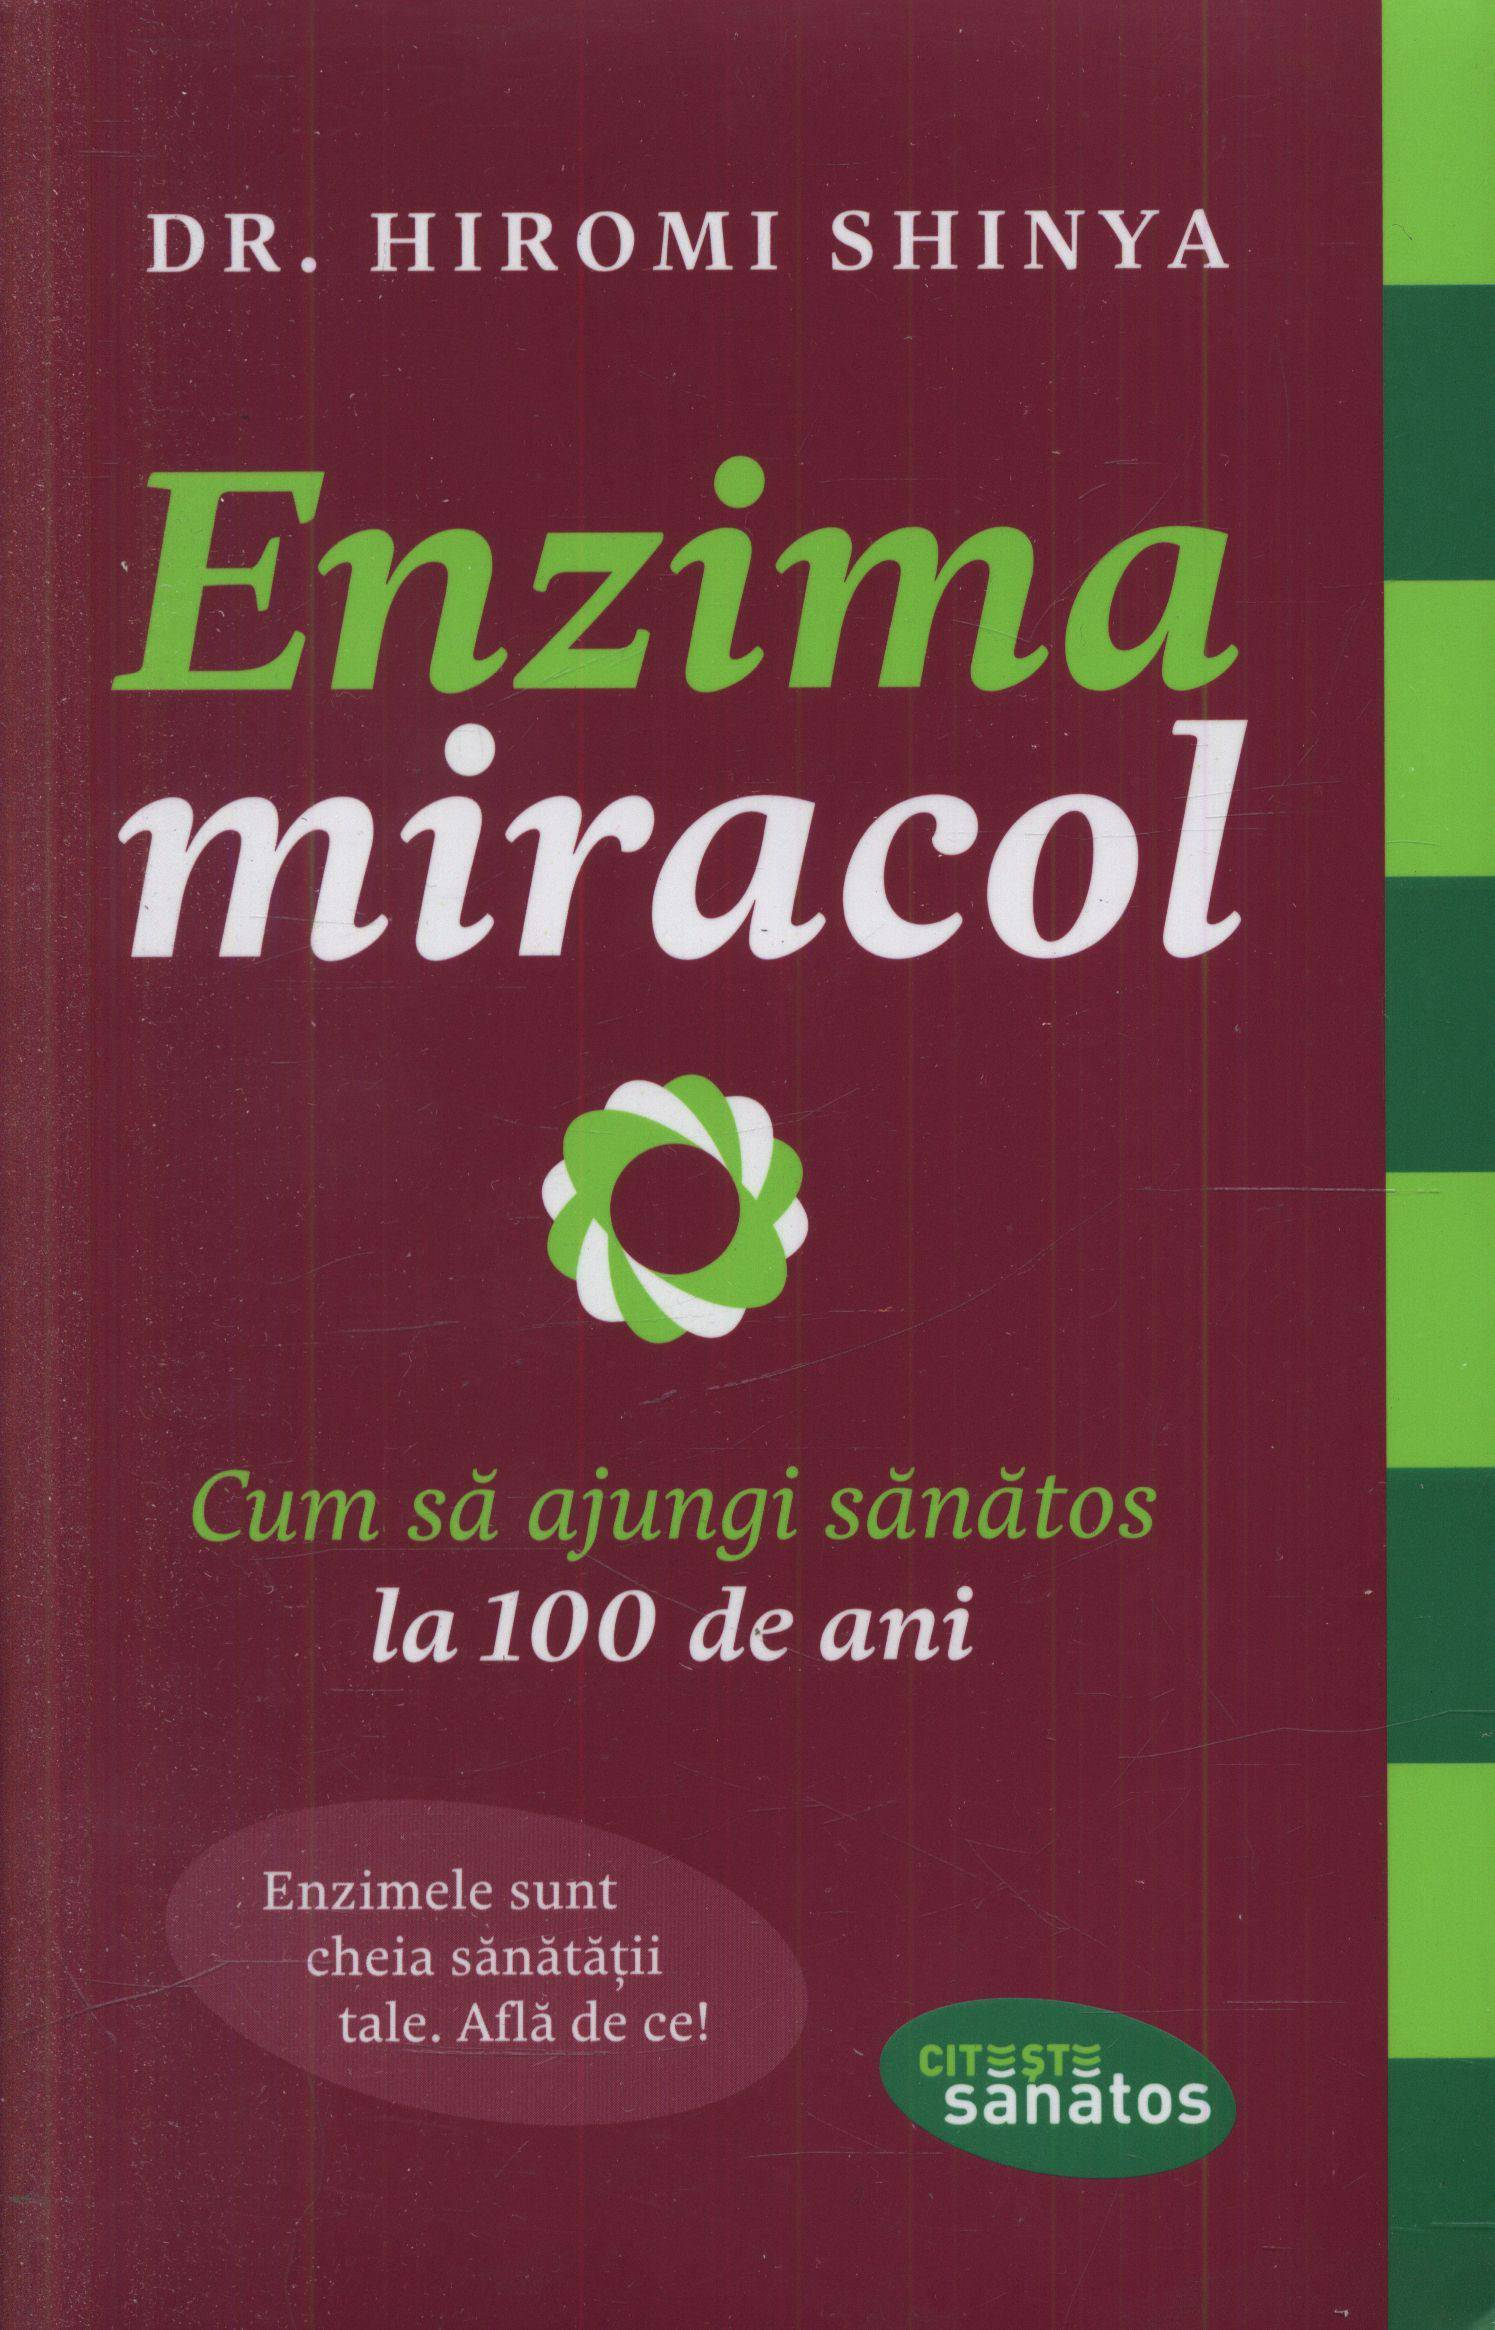 Enzima Miracol Dr. Hiromi Shinya